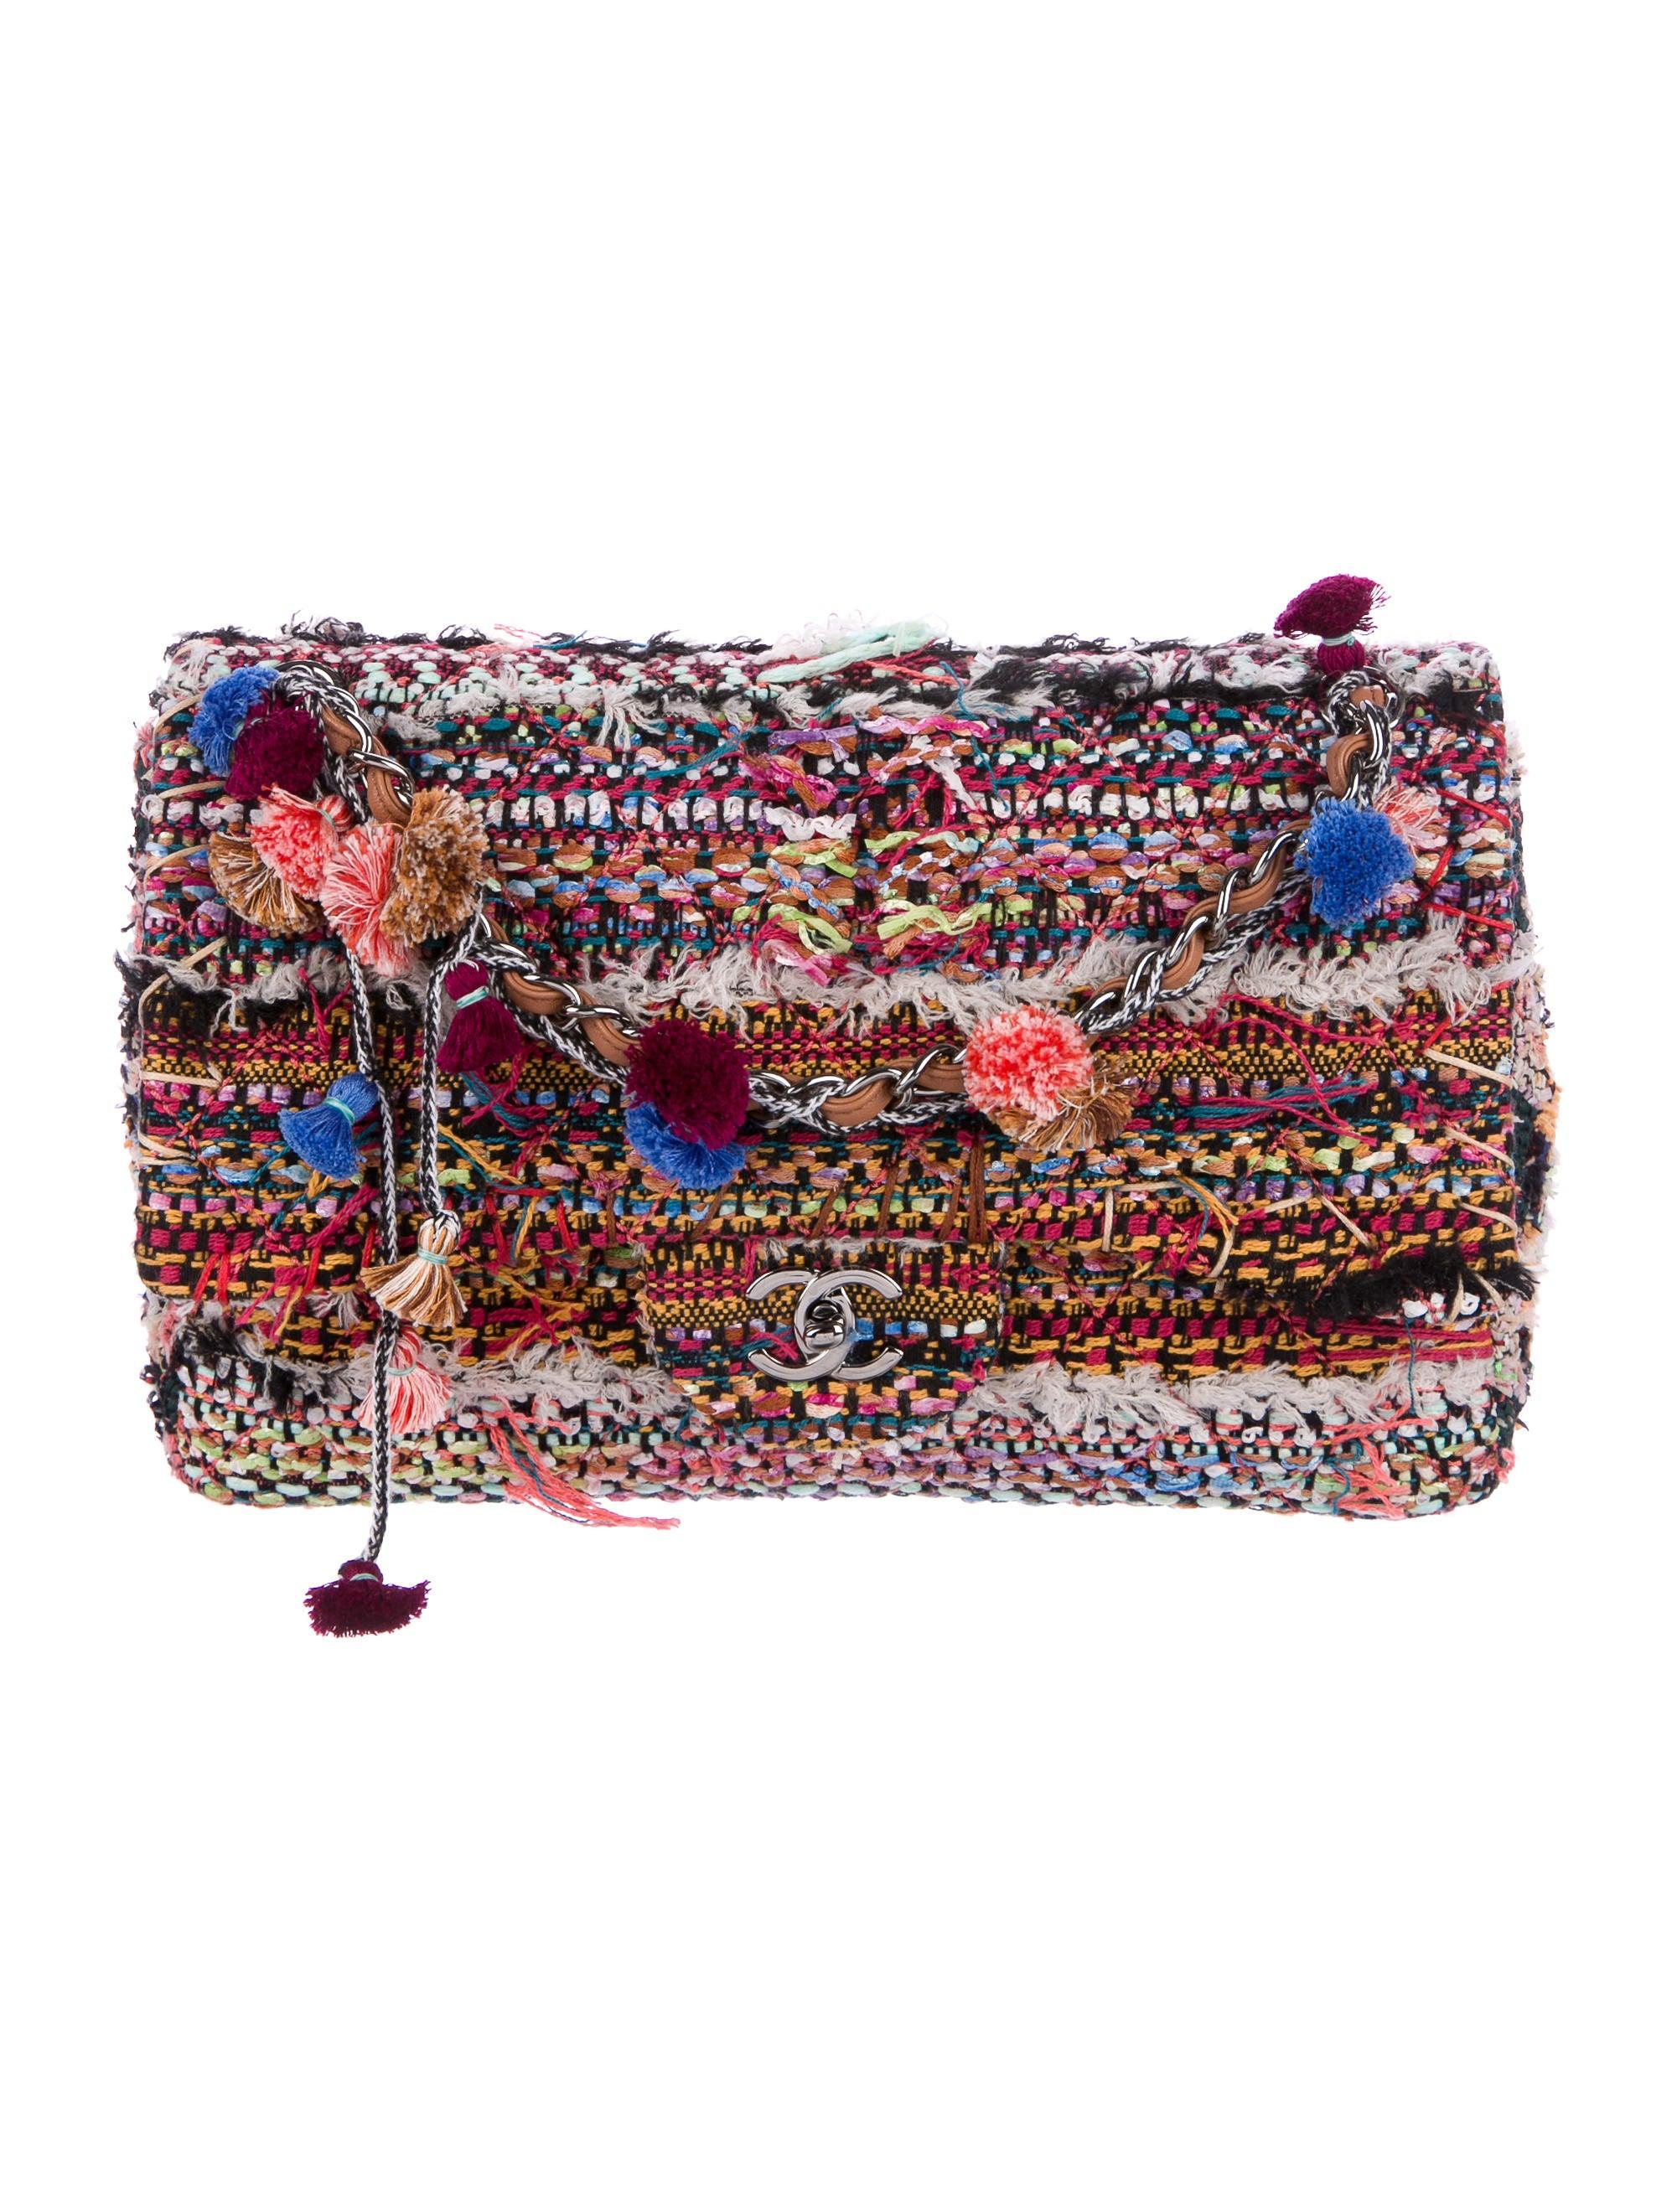 c71e5ab41a9b7b Chanel Classic Jumbo Tweed Pom-Pom Single Flap Bag w/ Tags ...